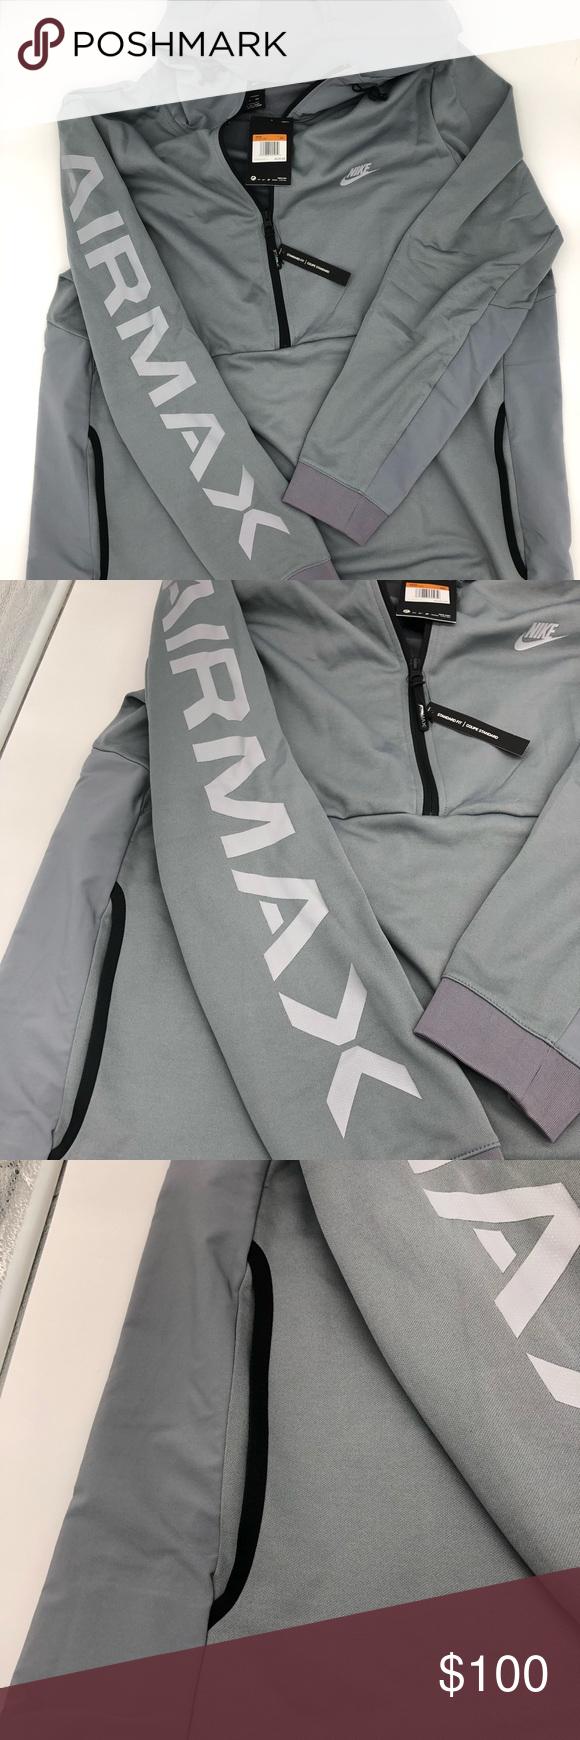 2XL Mens Nike Air Max Half Zip Pullover